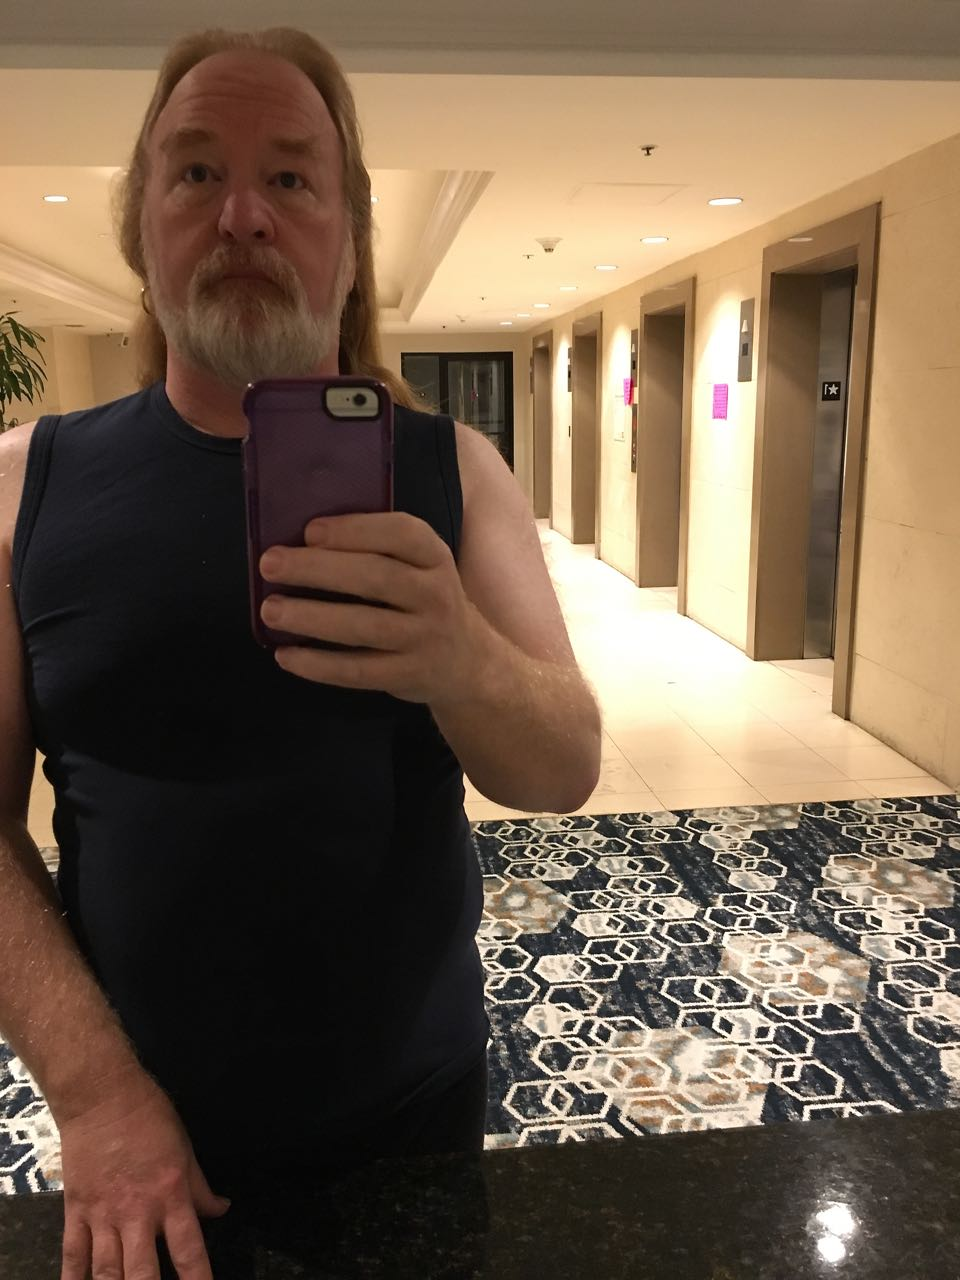 Selfie Jenya D nudes (68 foto and video), Tits, Hot, Selfie, in bikini 2020